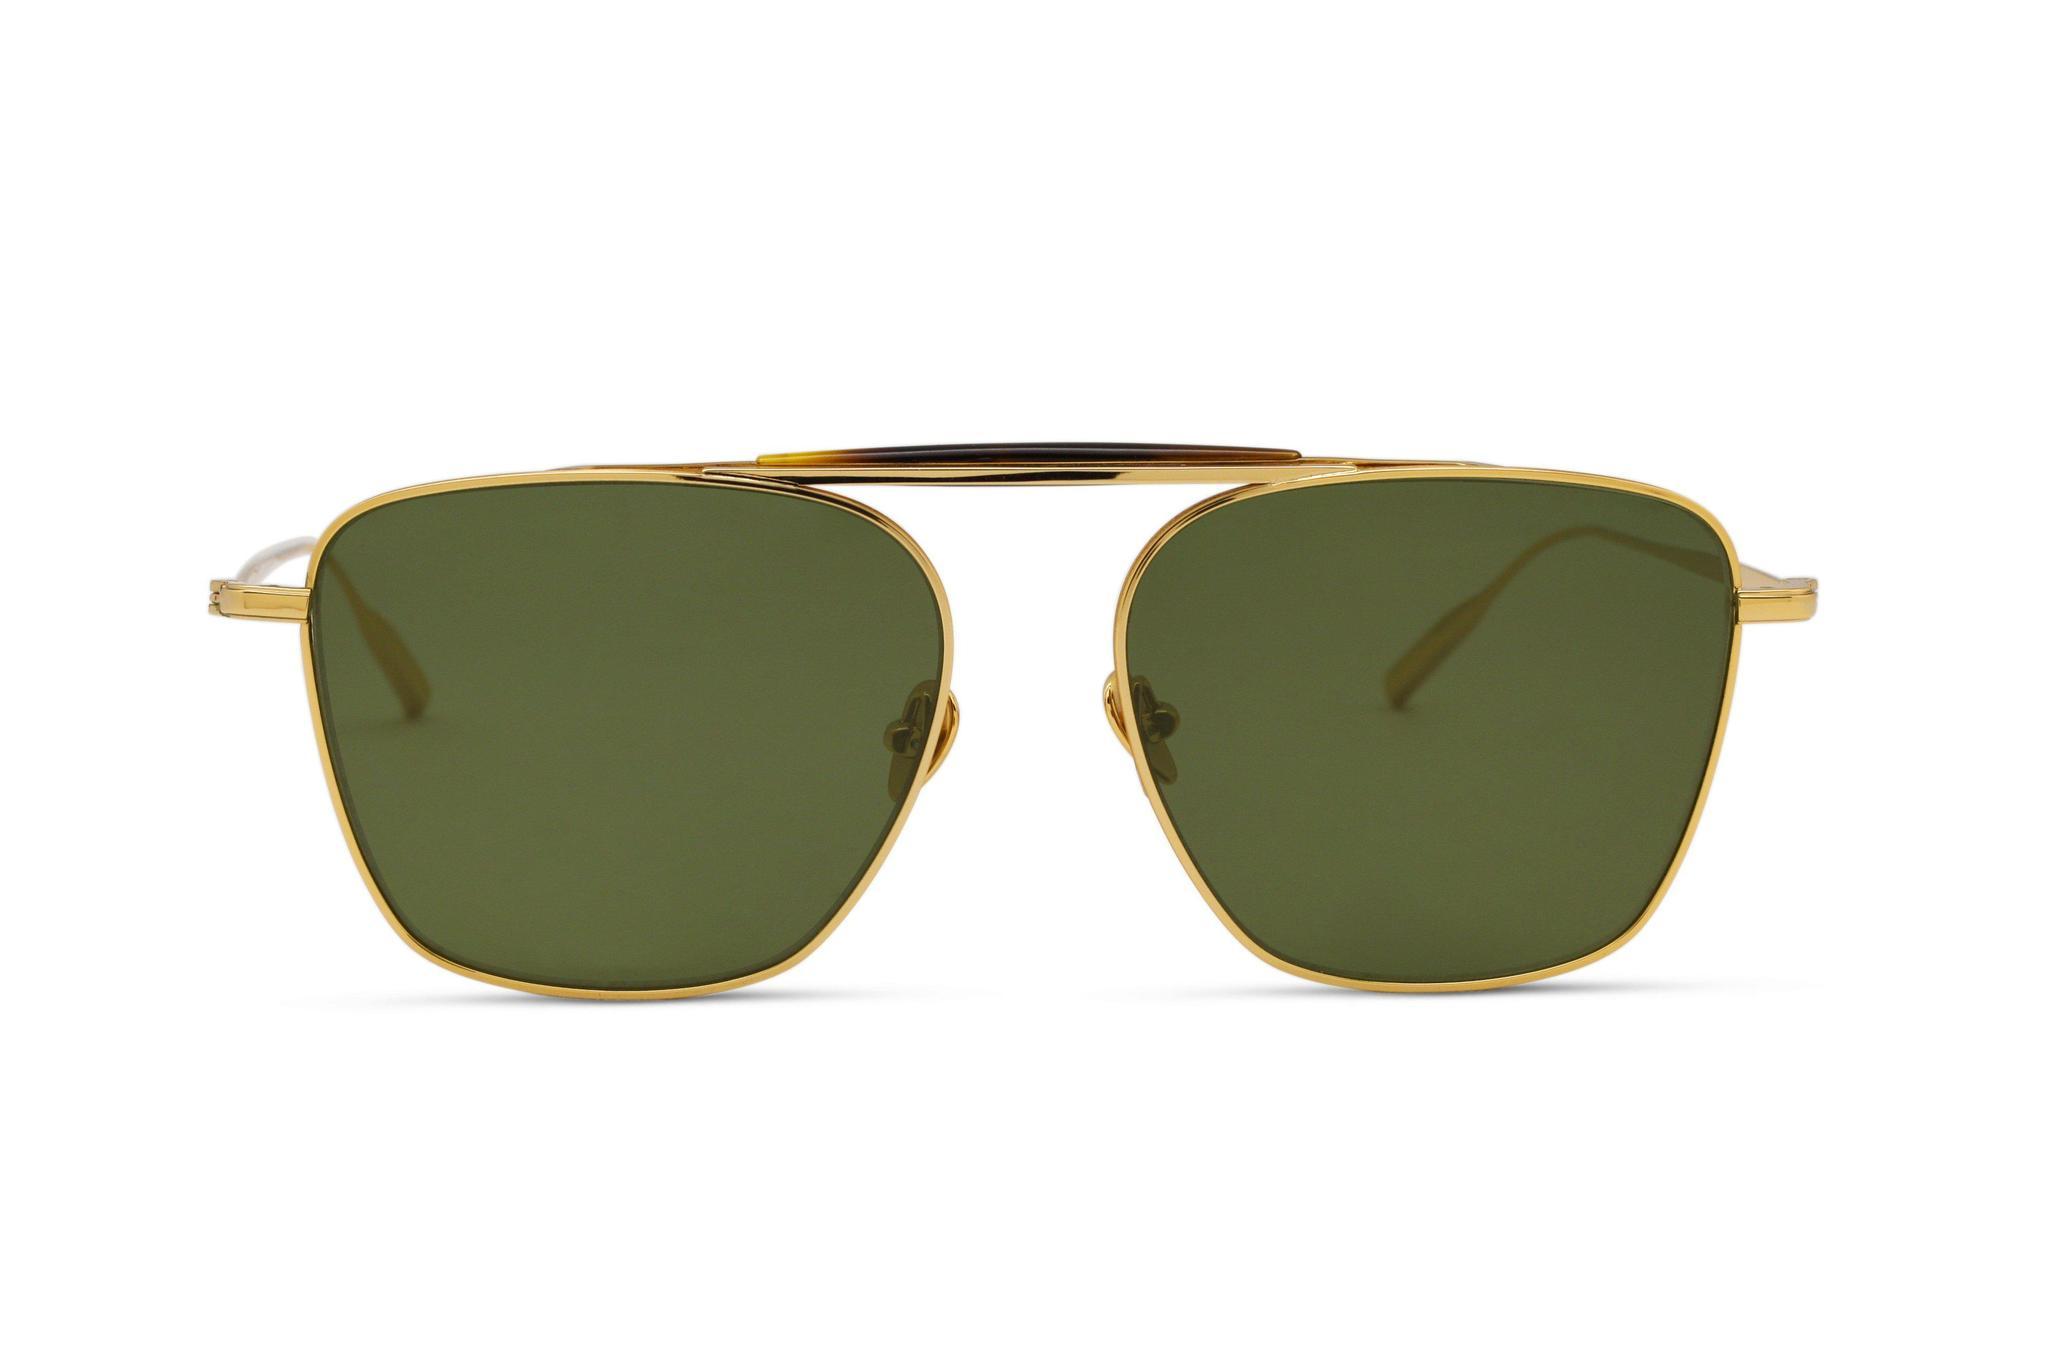 Benjamin Sunglasses by Amavii, available on amavii.com for $155 Gigi Hadid Sunglasses Exact Product